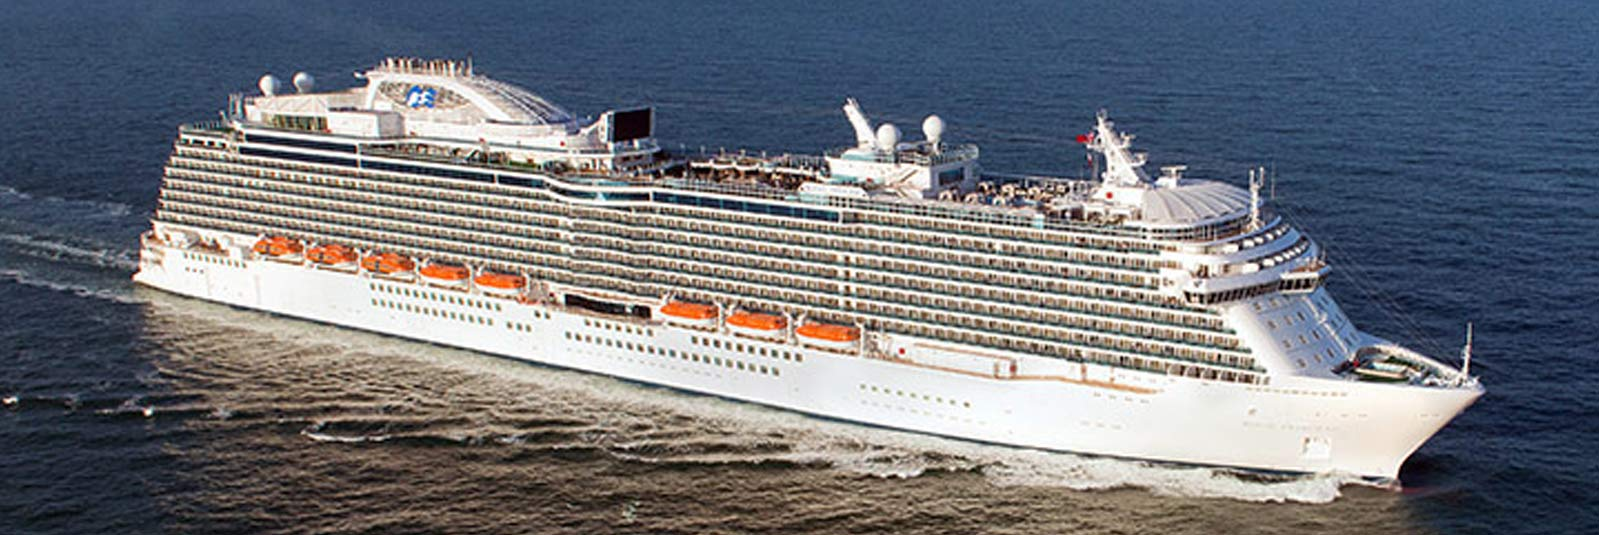 Round Trip Transatlantic Cruise Etobo - Round trip transatlantic cruise